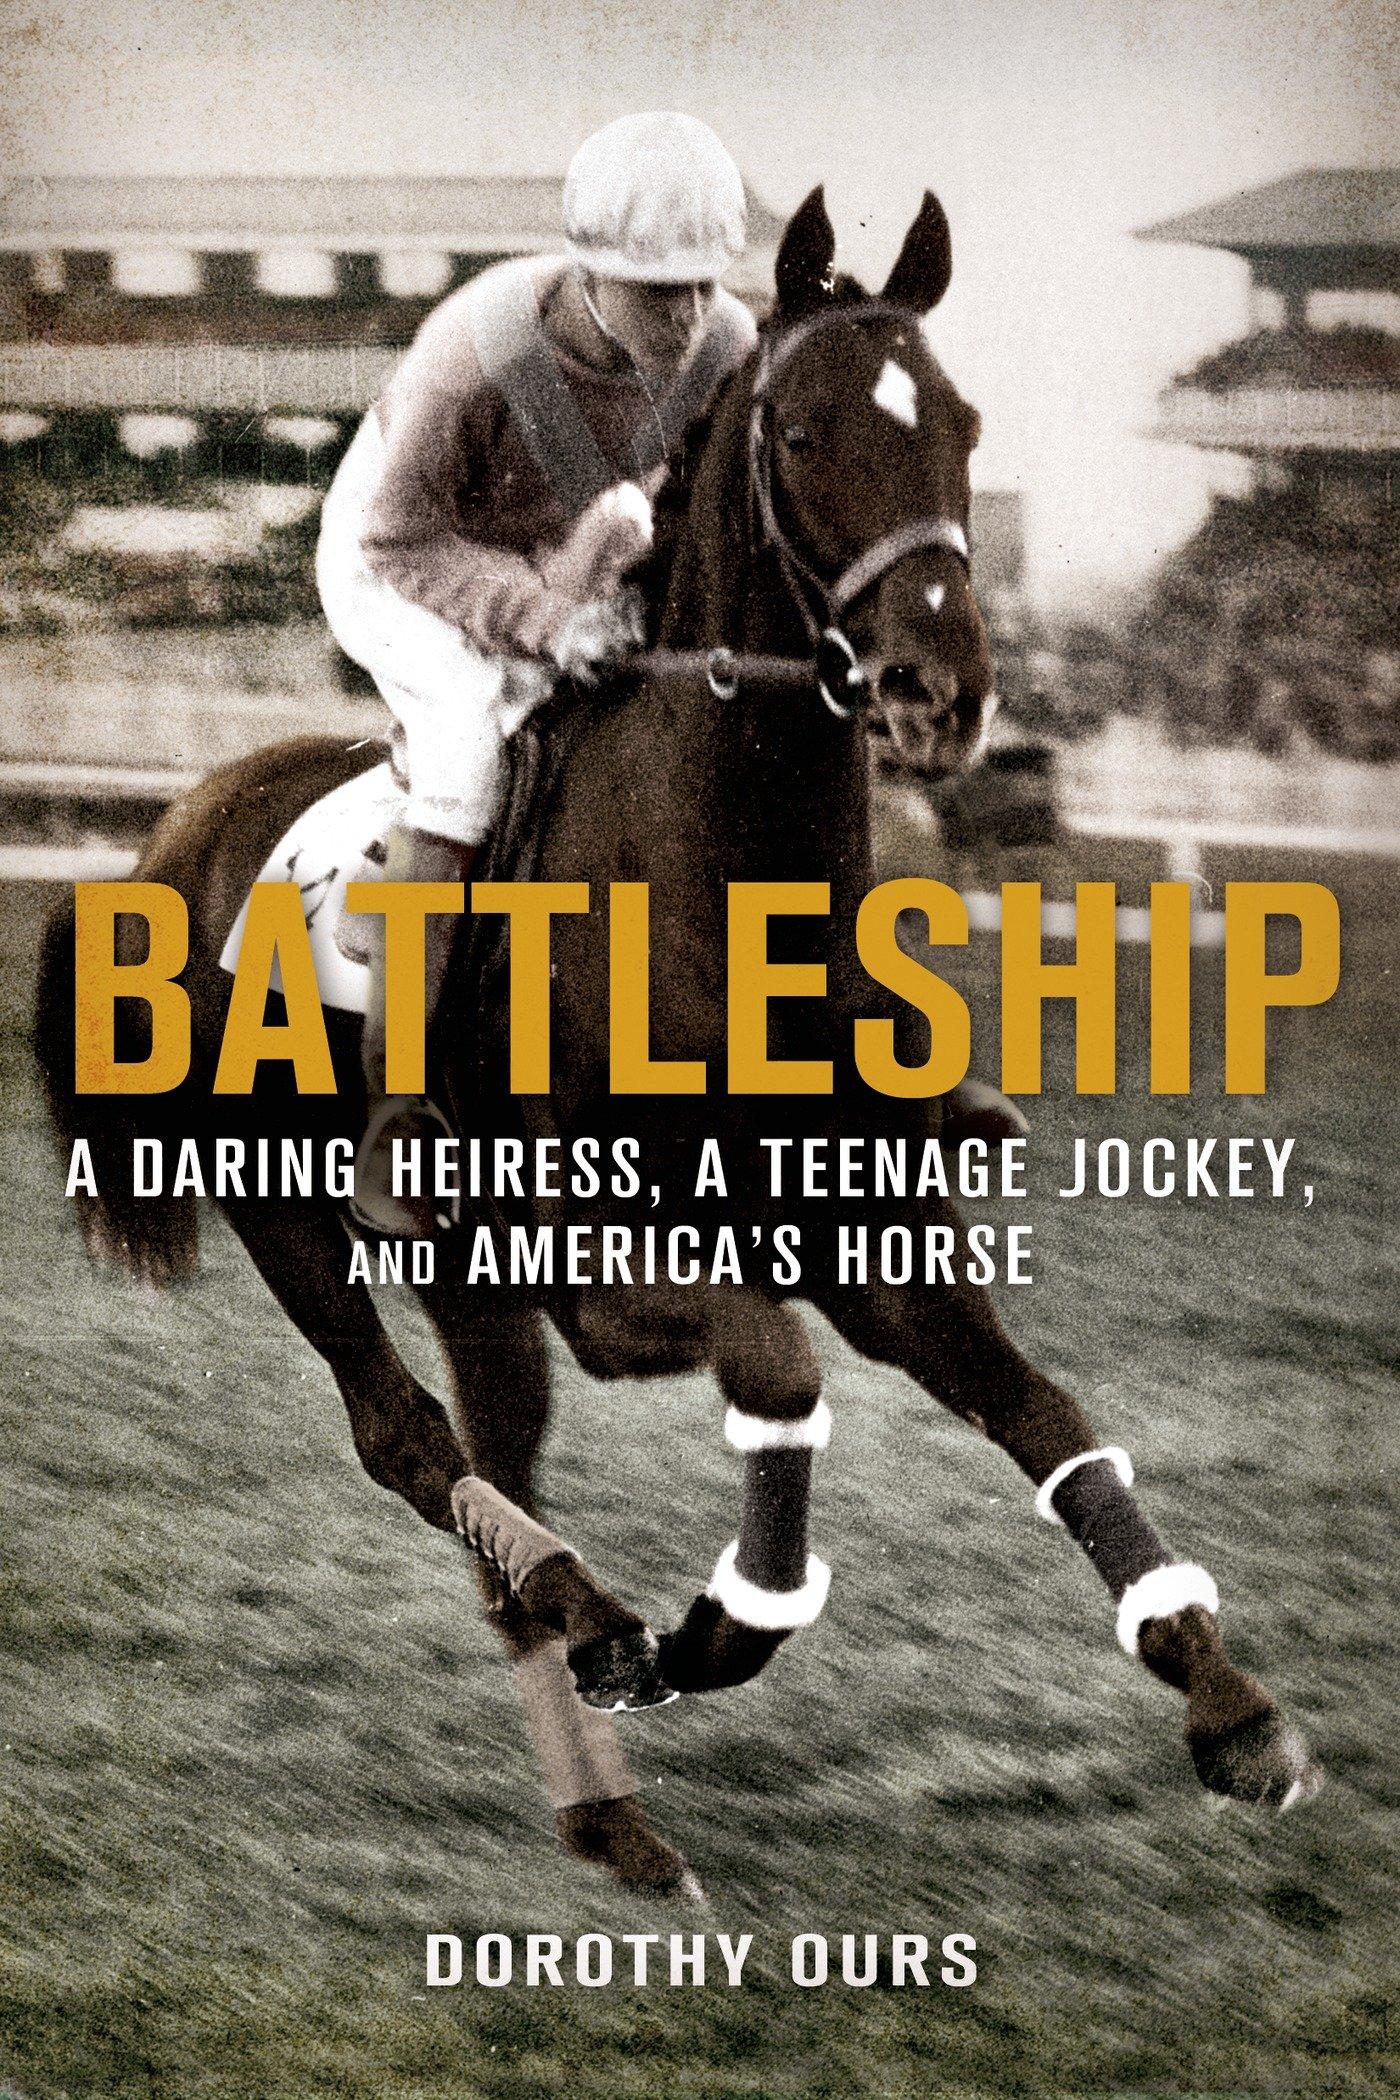 Download Battleship: A Daring Heiress, a Teenage Jockey, and America's Horse PDF